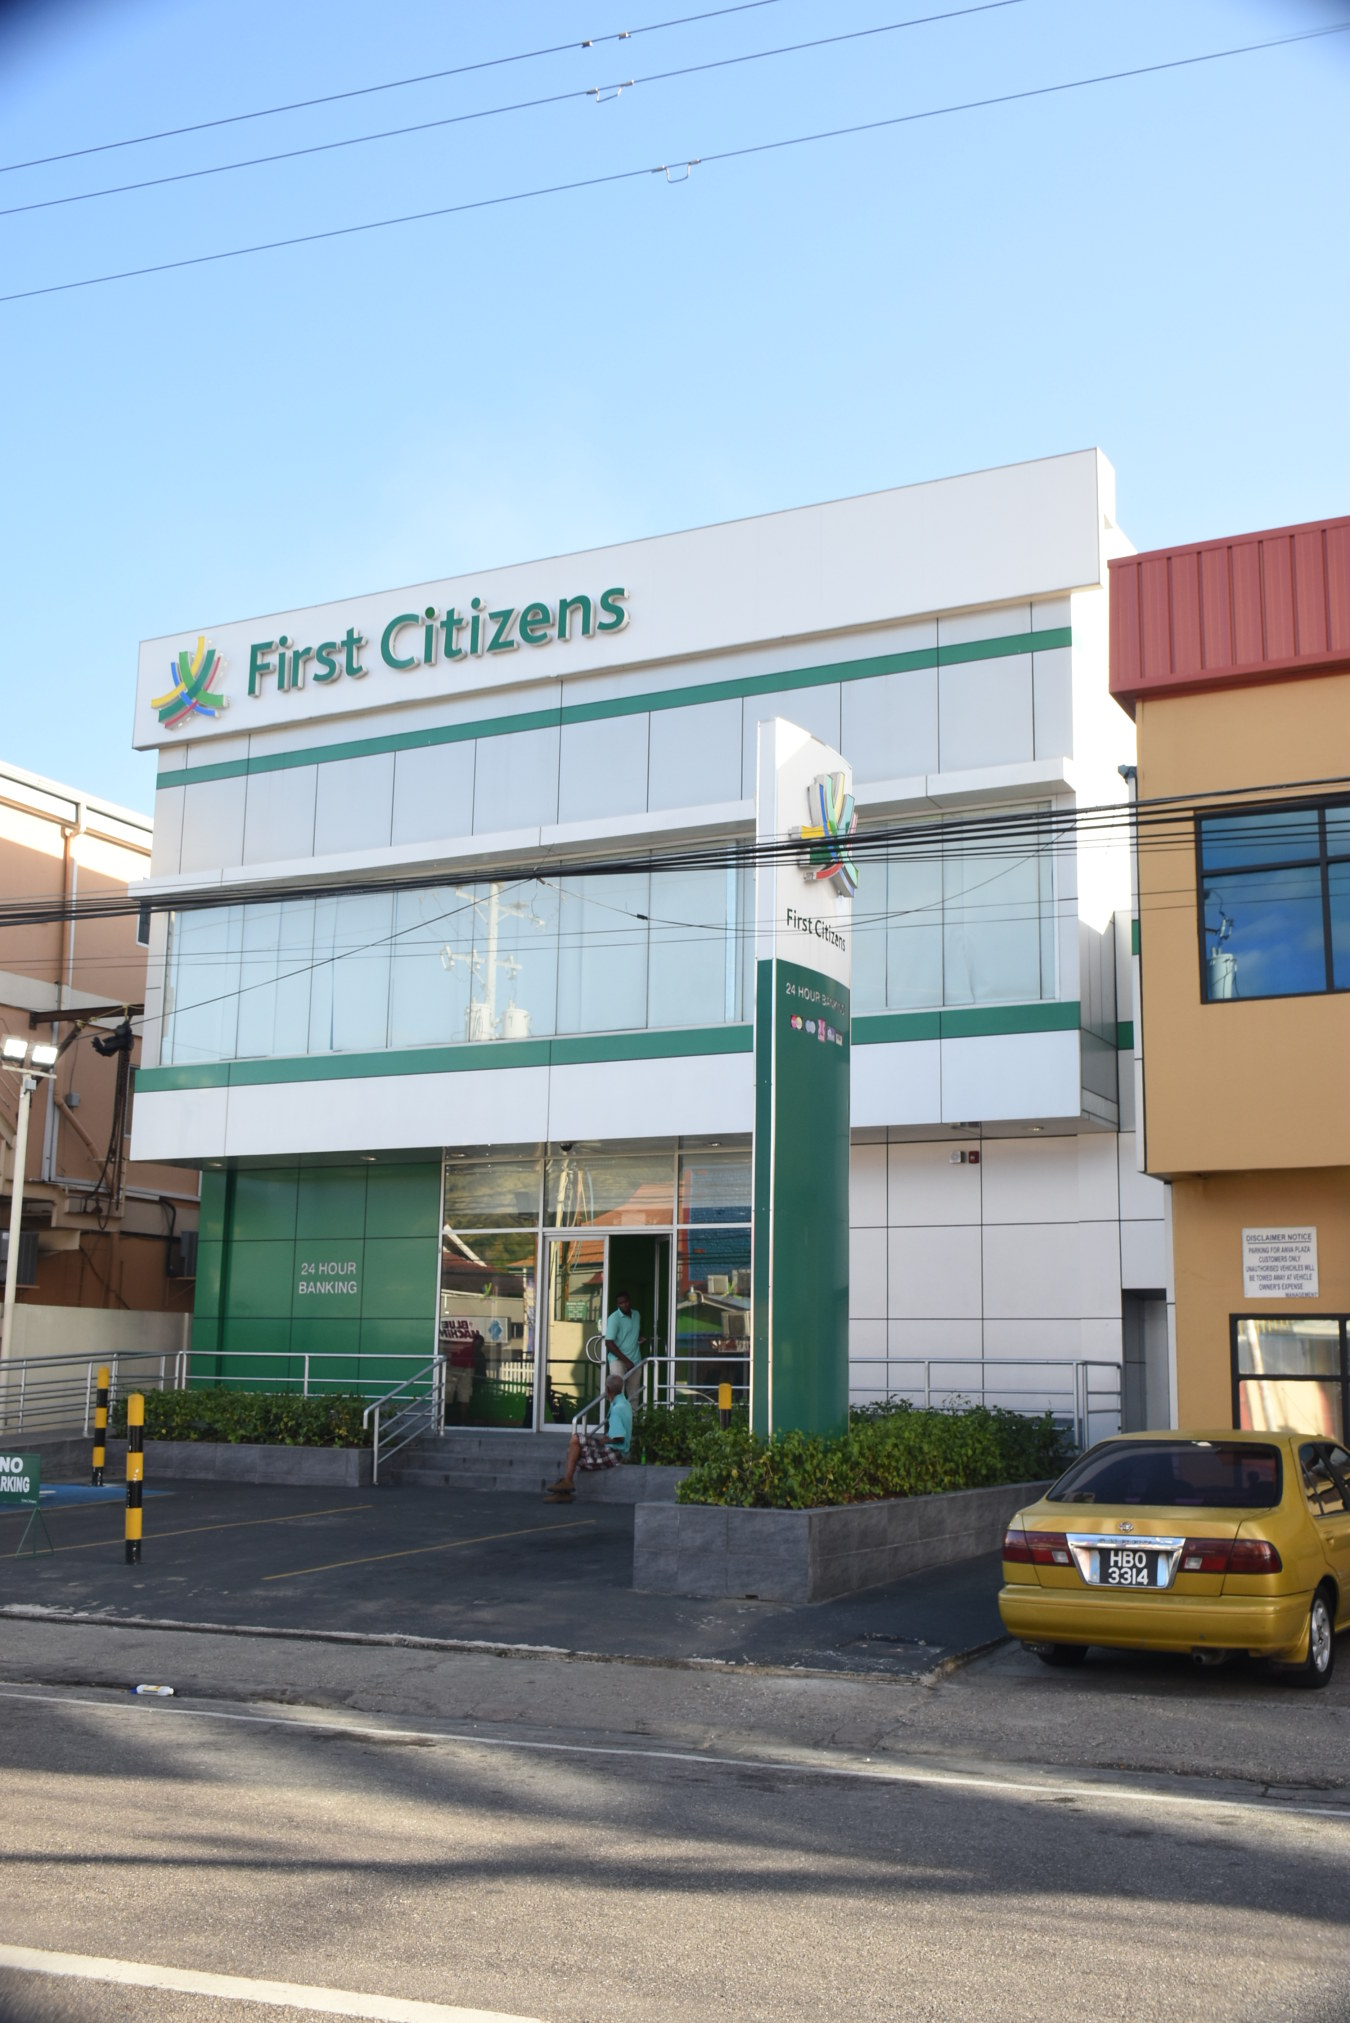 FCBFR29